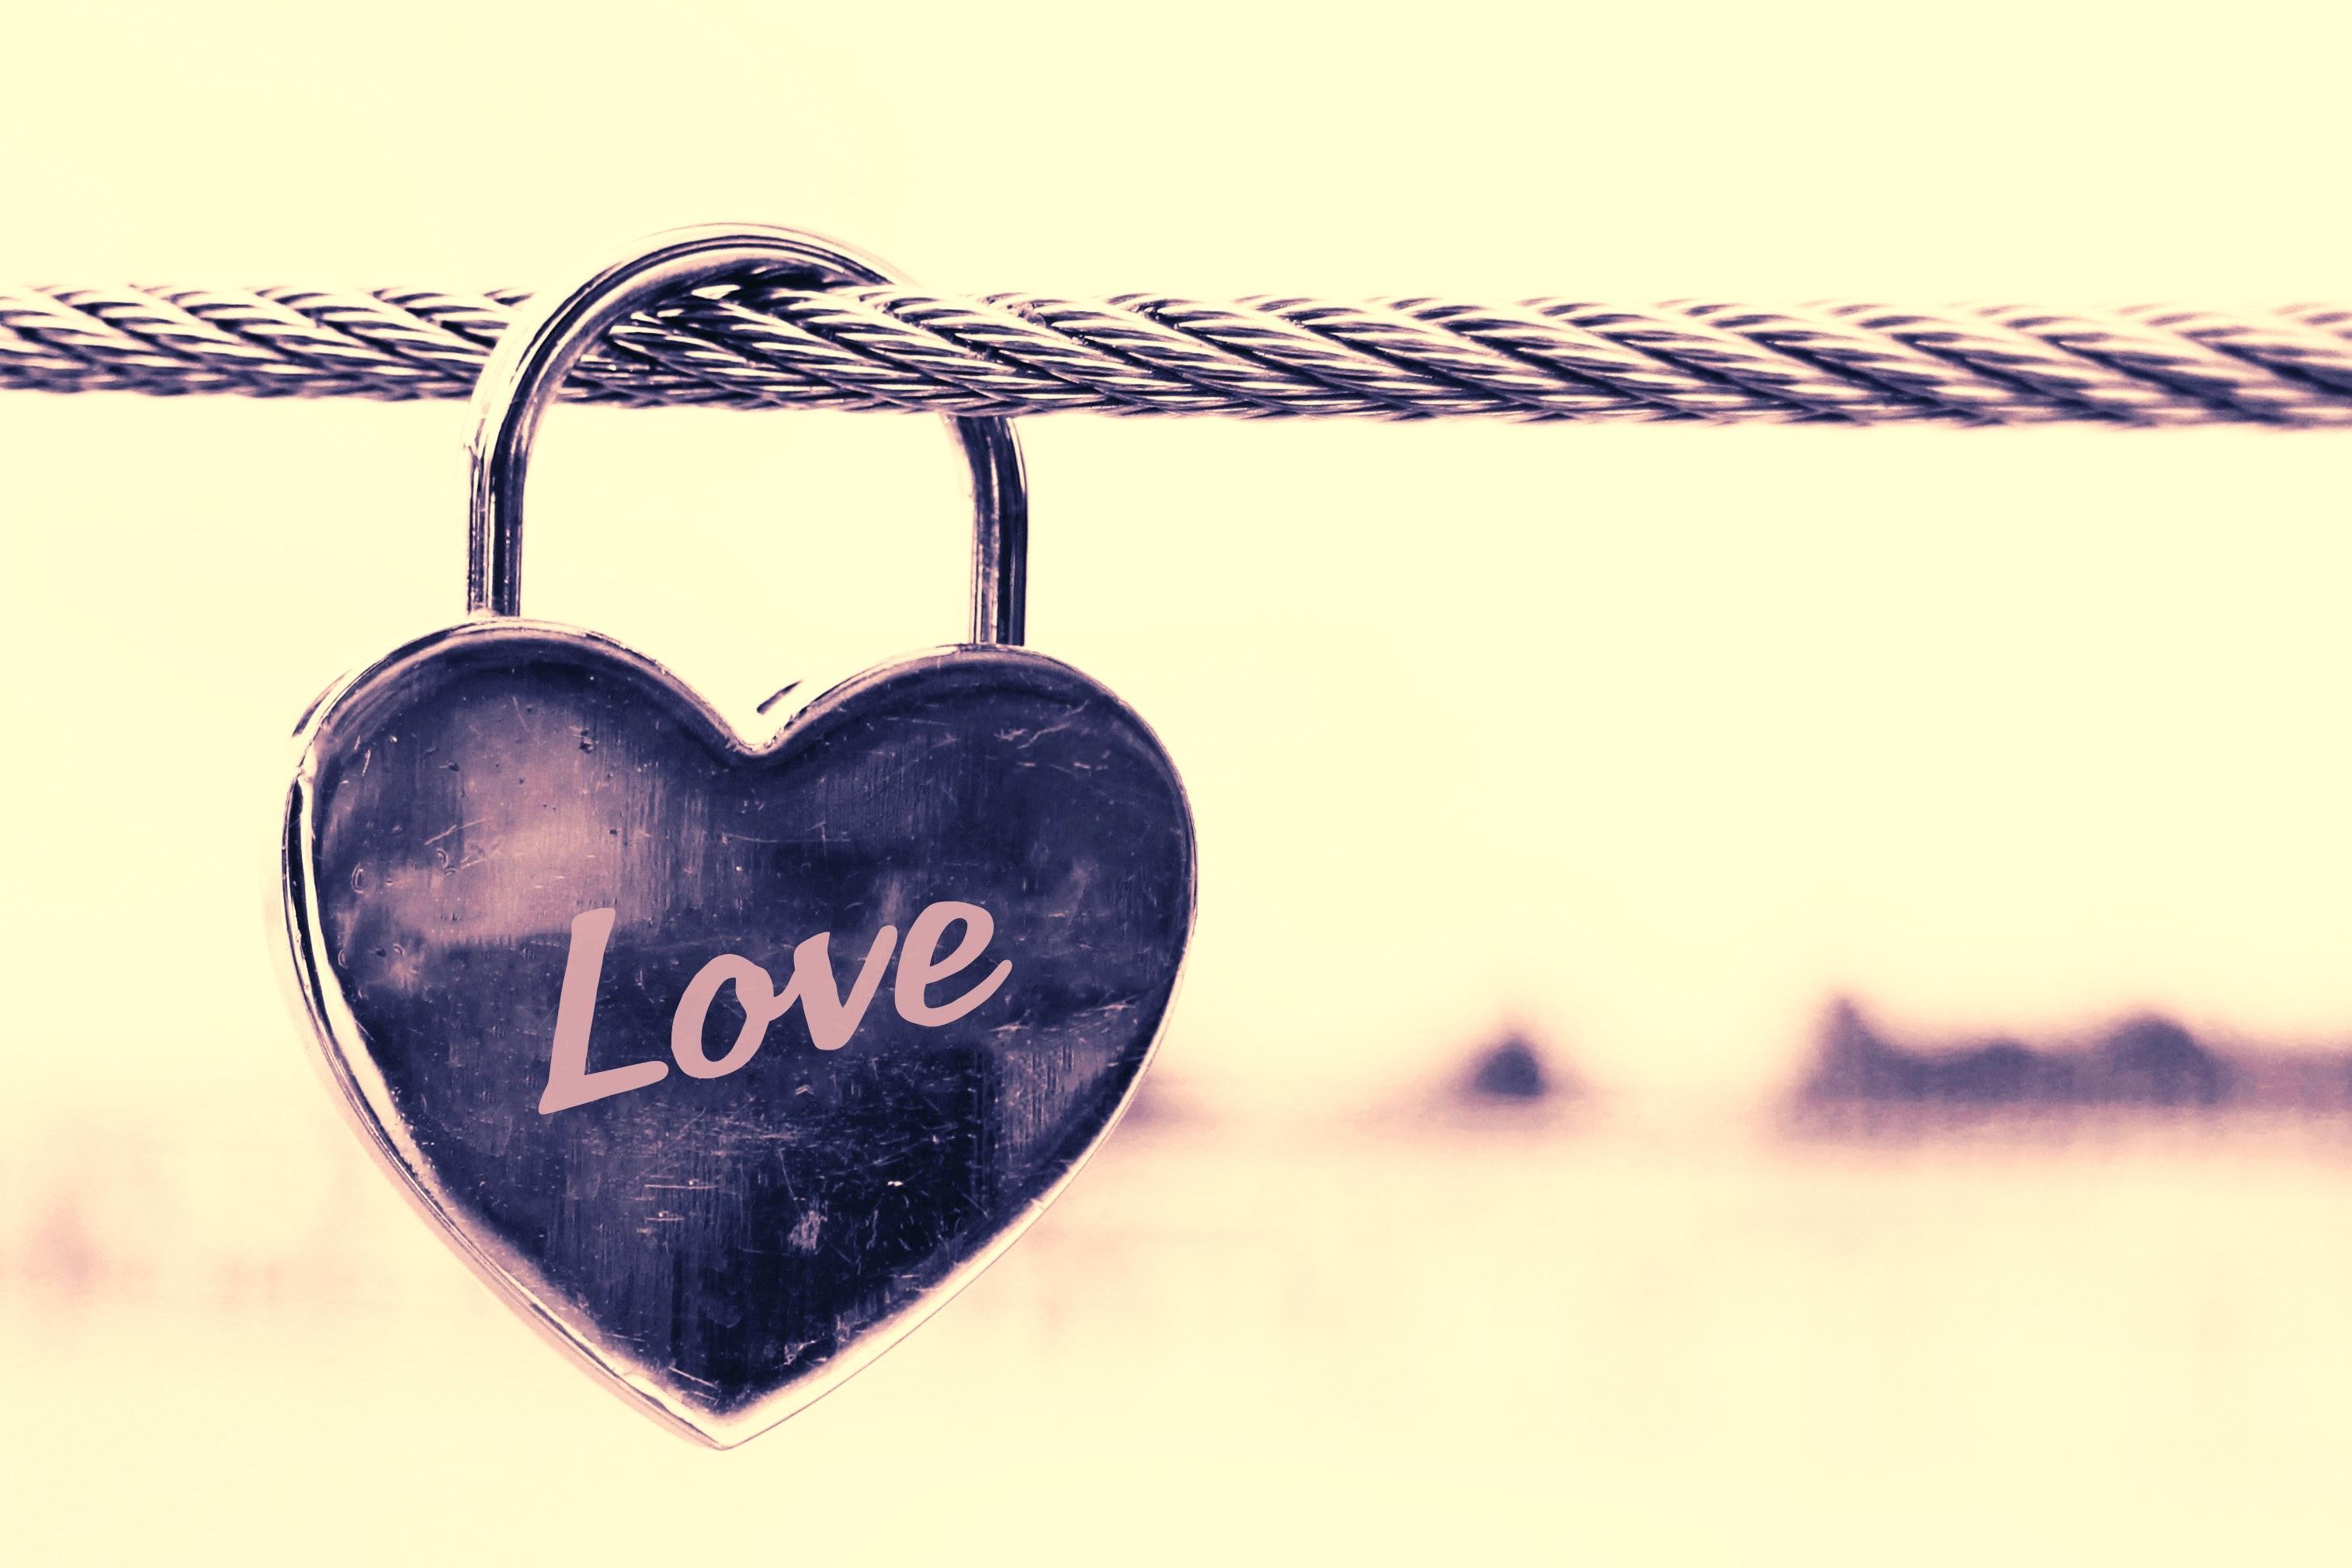 Rakastumisen pelko